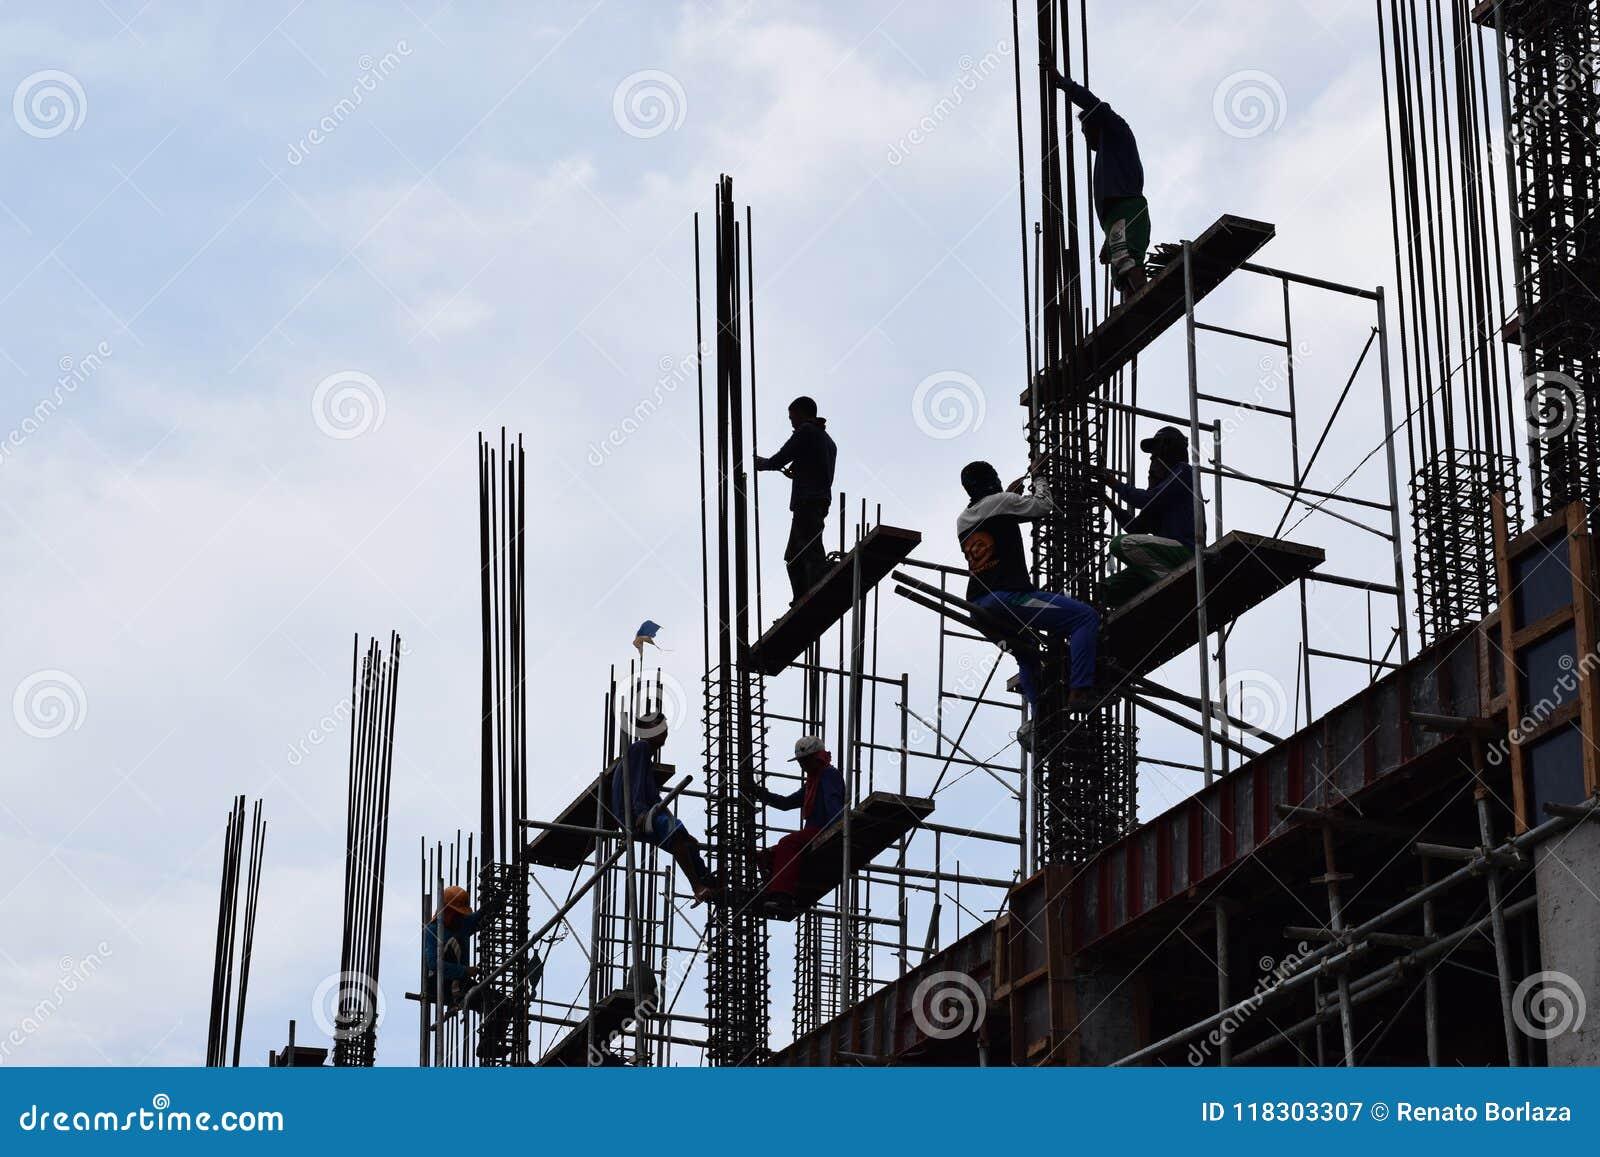 Filipino Construction Steel-men Working Joining Column Steel Pieces